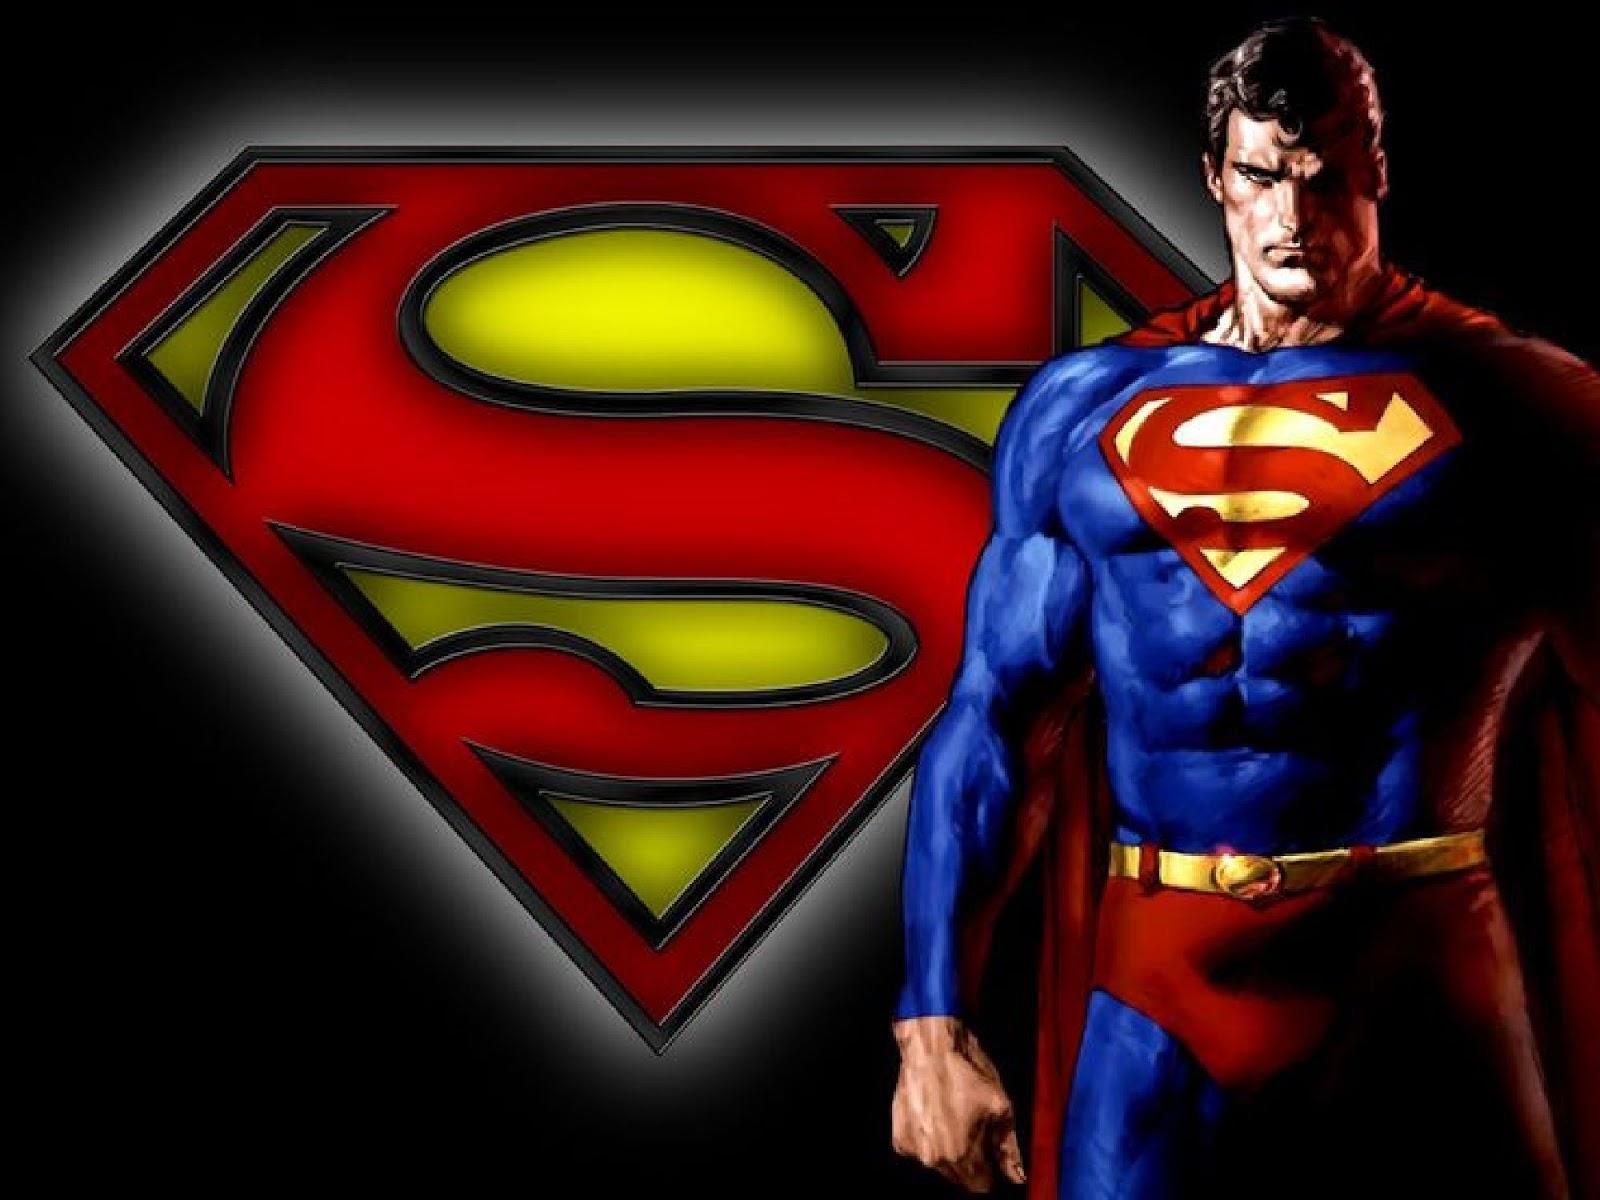 Animasi Kartun Keren Kolek Gambar Wallpaper Superman Lucu